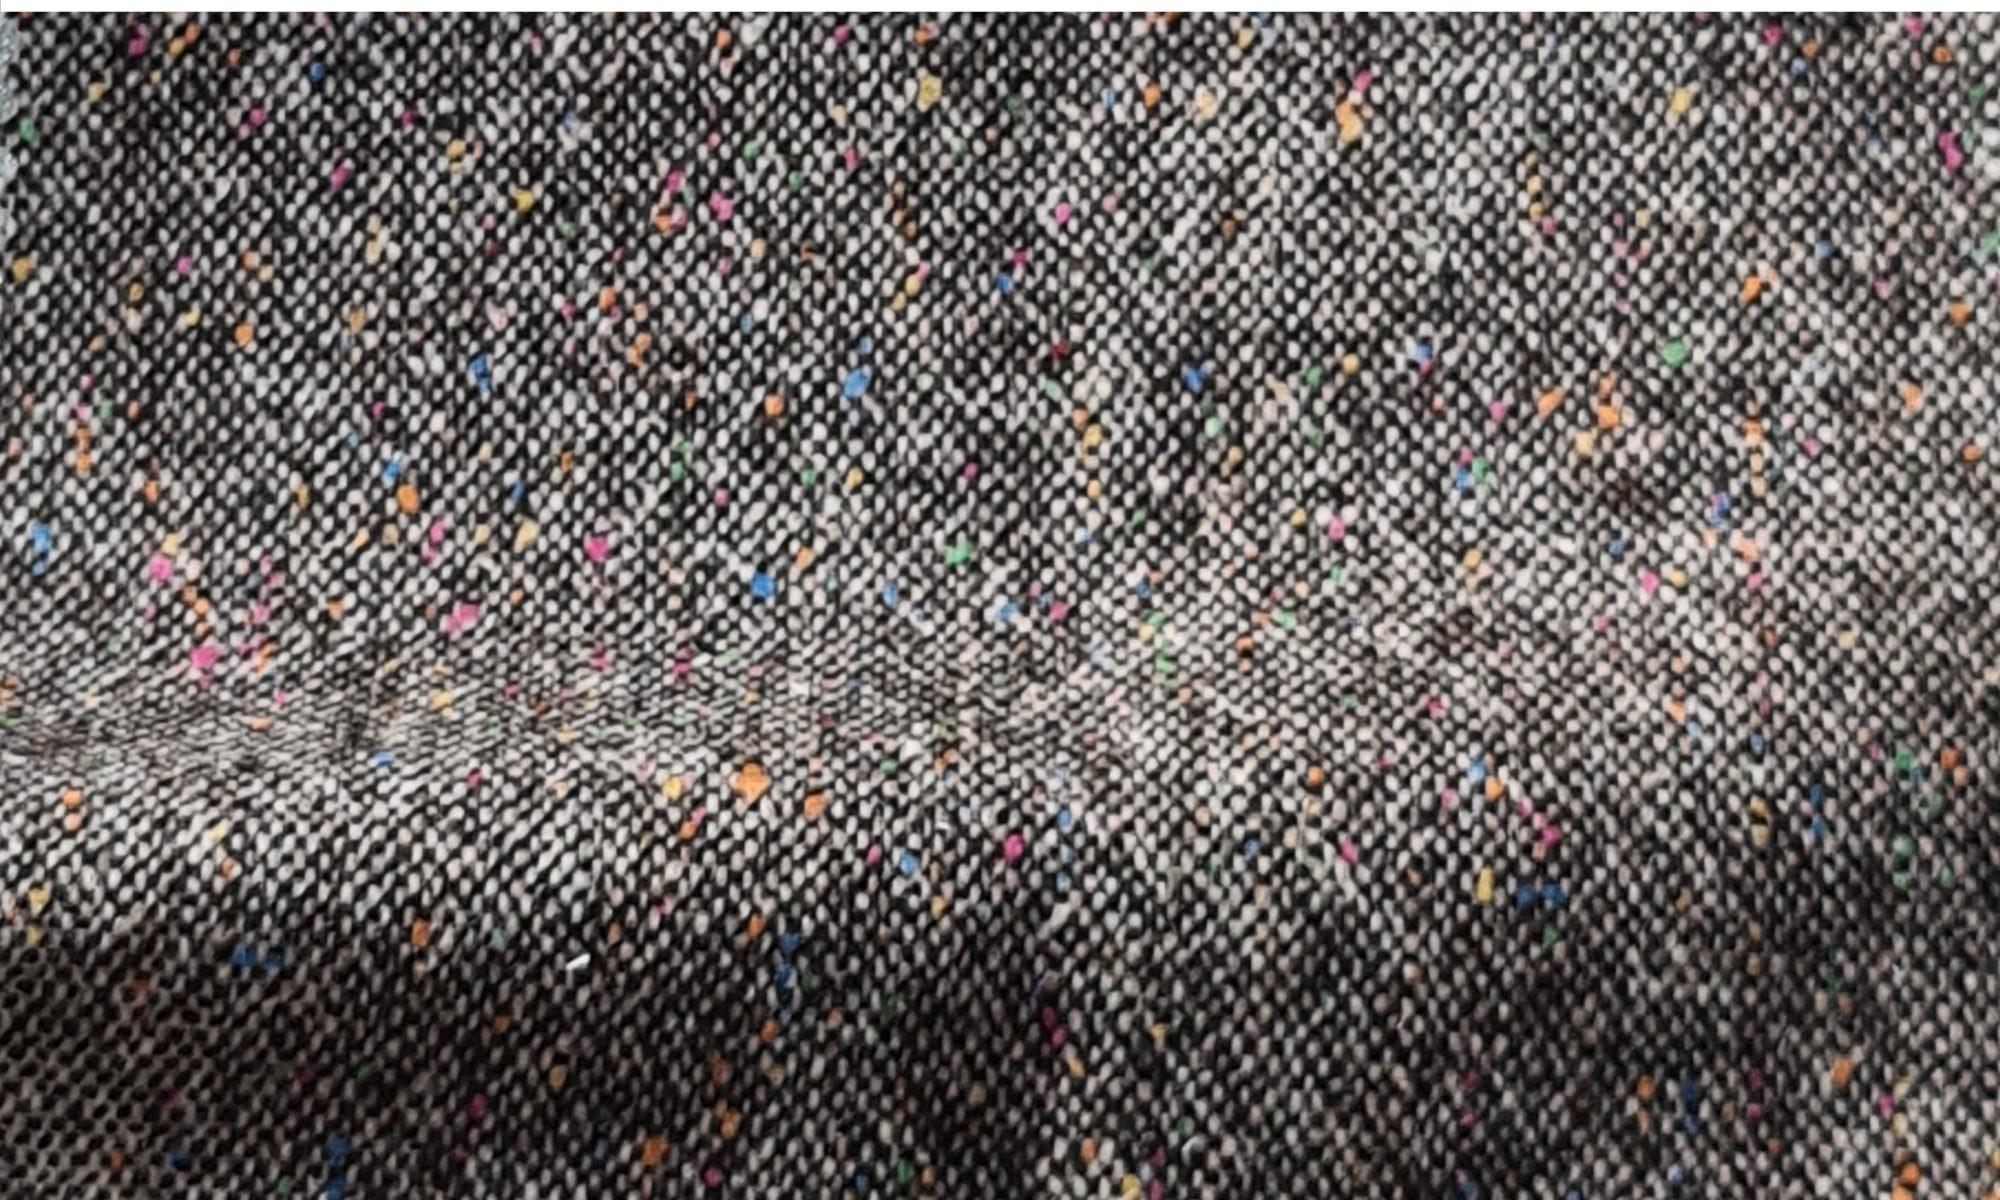 7622 knickerbocker tweed brown jacket fabric WIDTH cm137 WEIGHT gr320 - gr233 square meter - COMPOSITION 45 Wool 32 Polyester 16 Acrylic 5 Silk 2 Elastan - 614mts